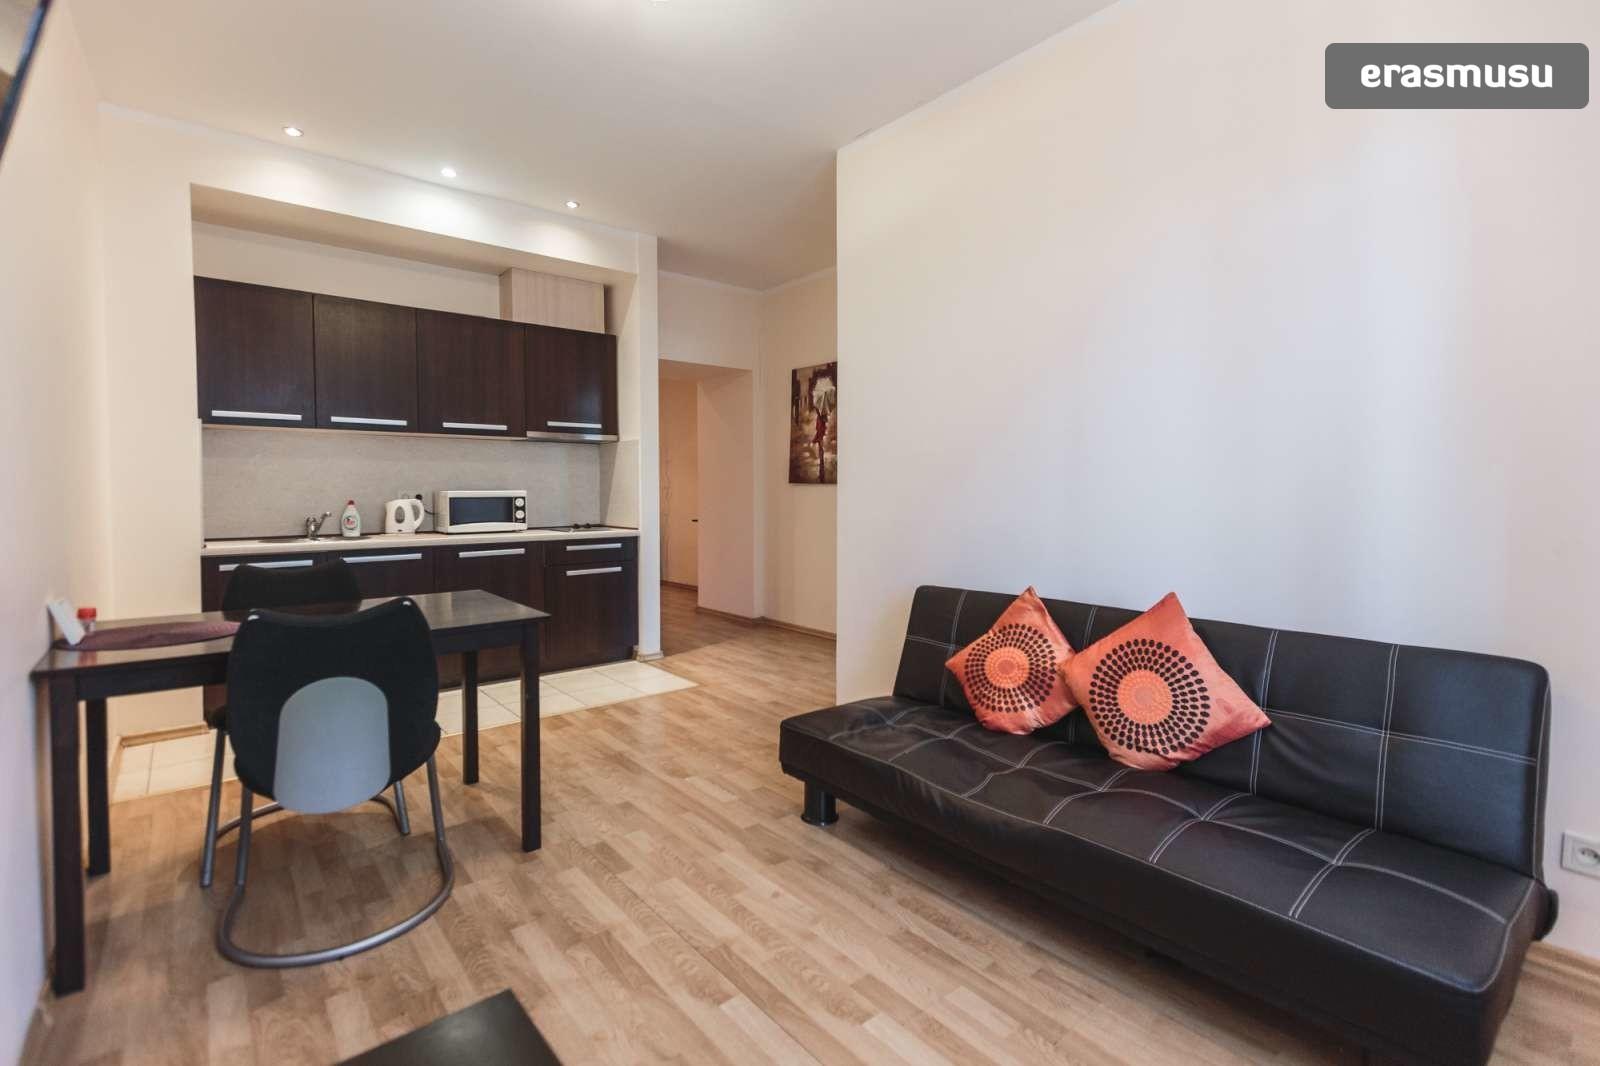 1-bedroom-apartment-rent-maskavas-forstate-43b2c60723fc611f4d3c3